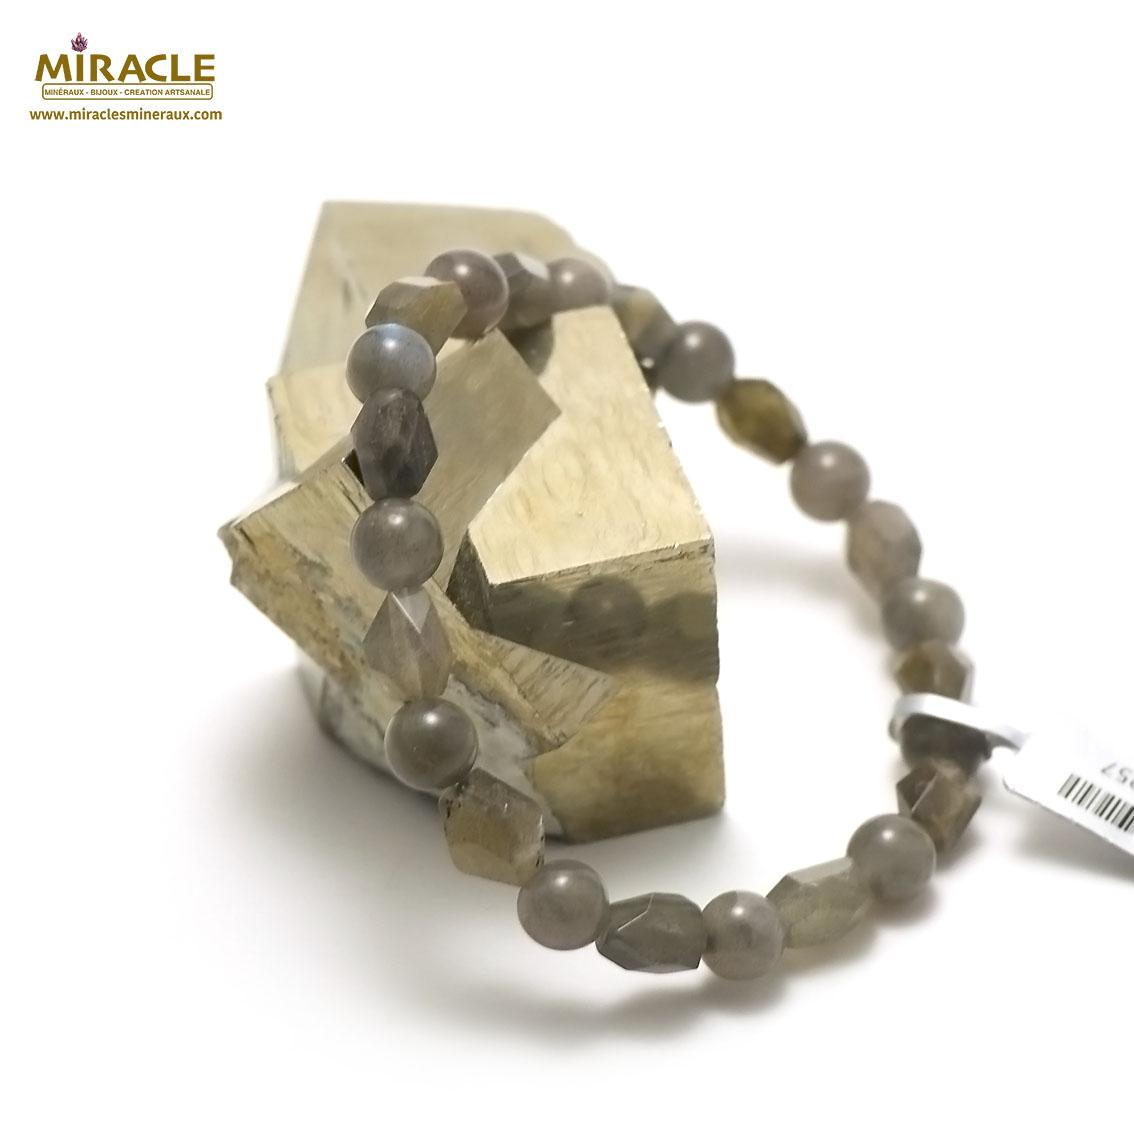 bracelet labradorite galet baroque - ronde 8 mm,pierre naturelle